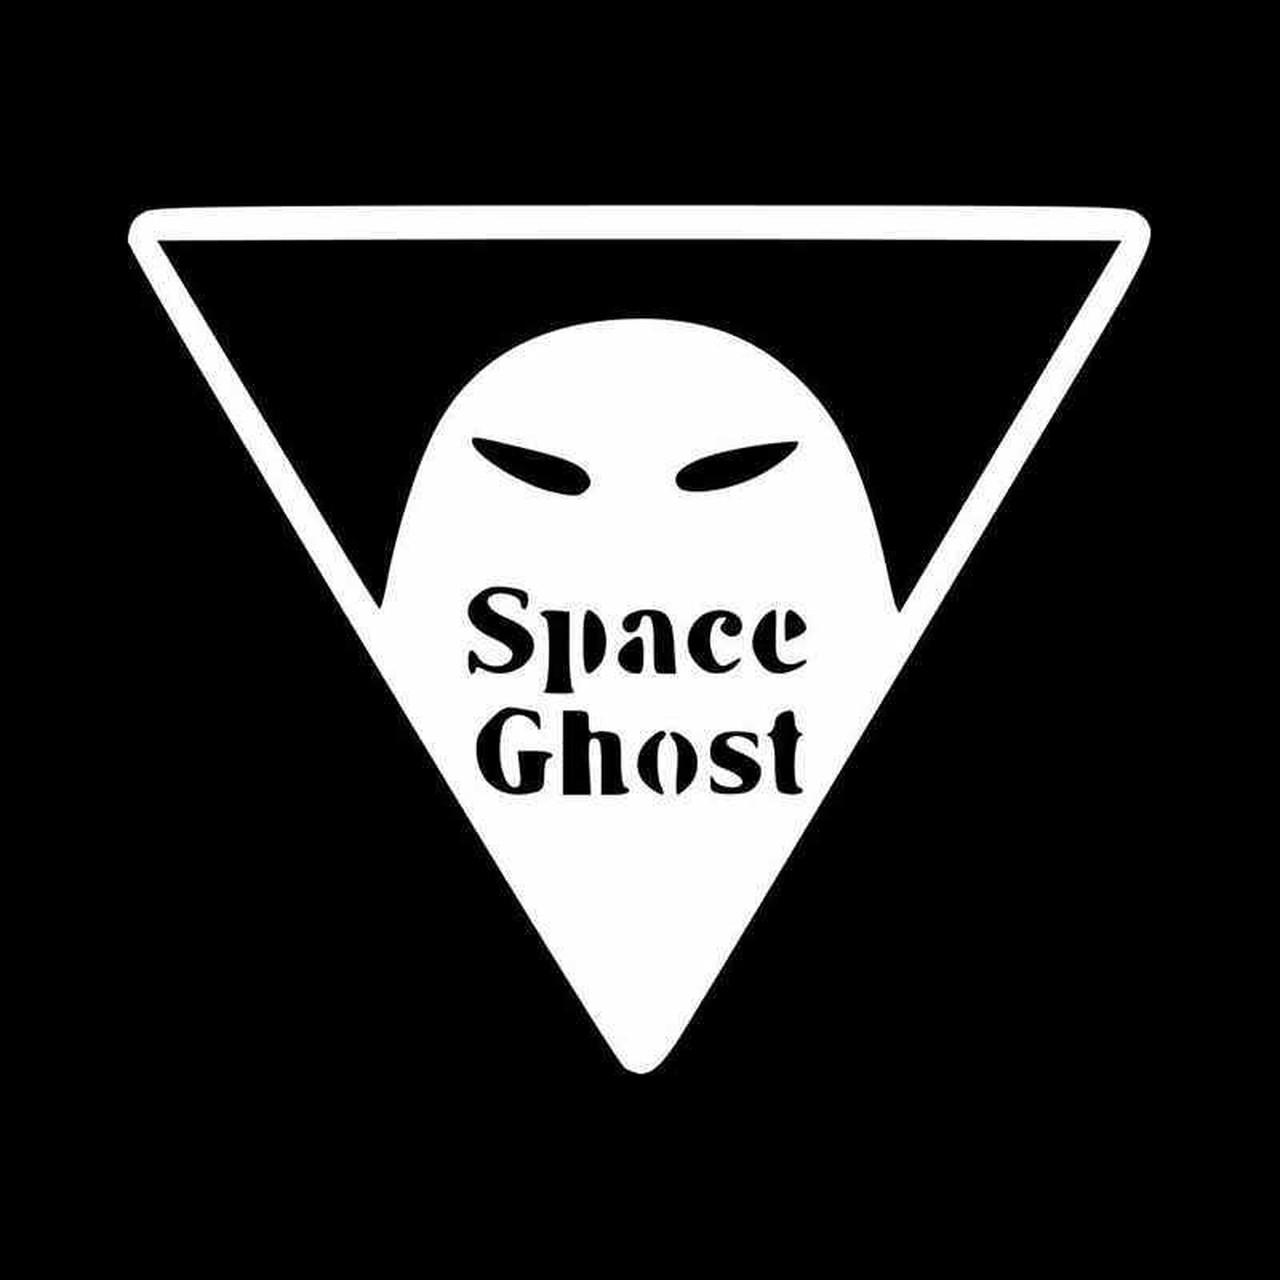 Space Ghost Vinyl Decal Sticker.